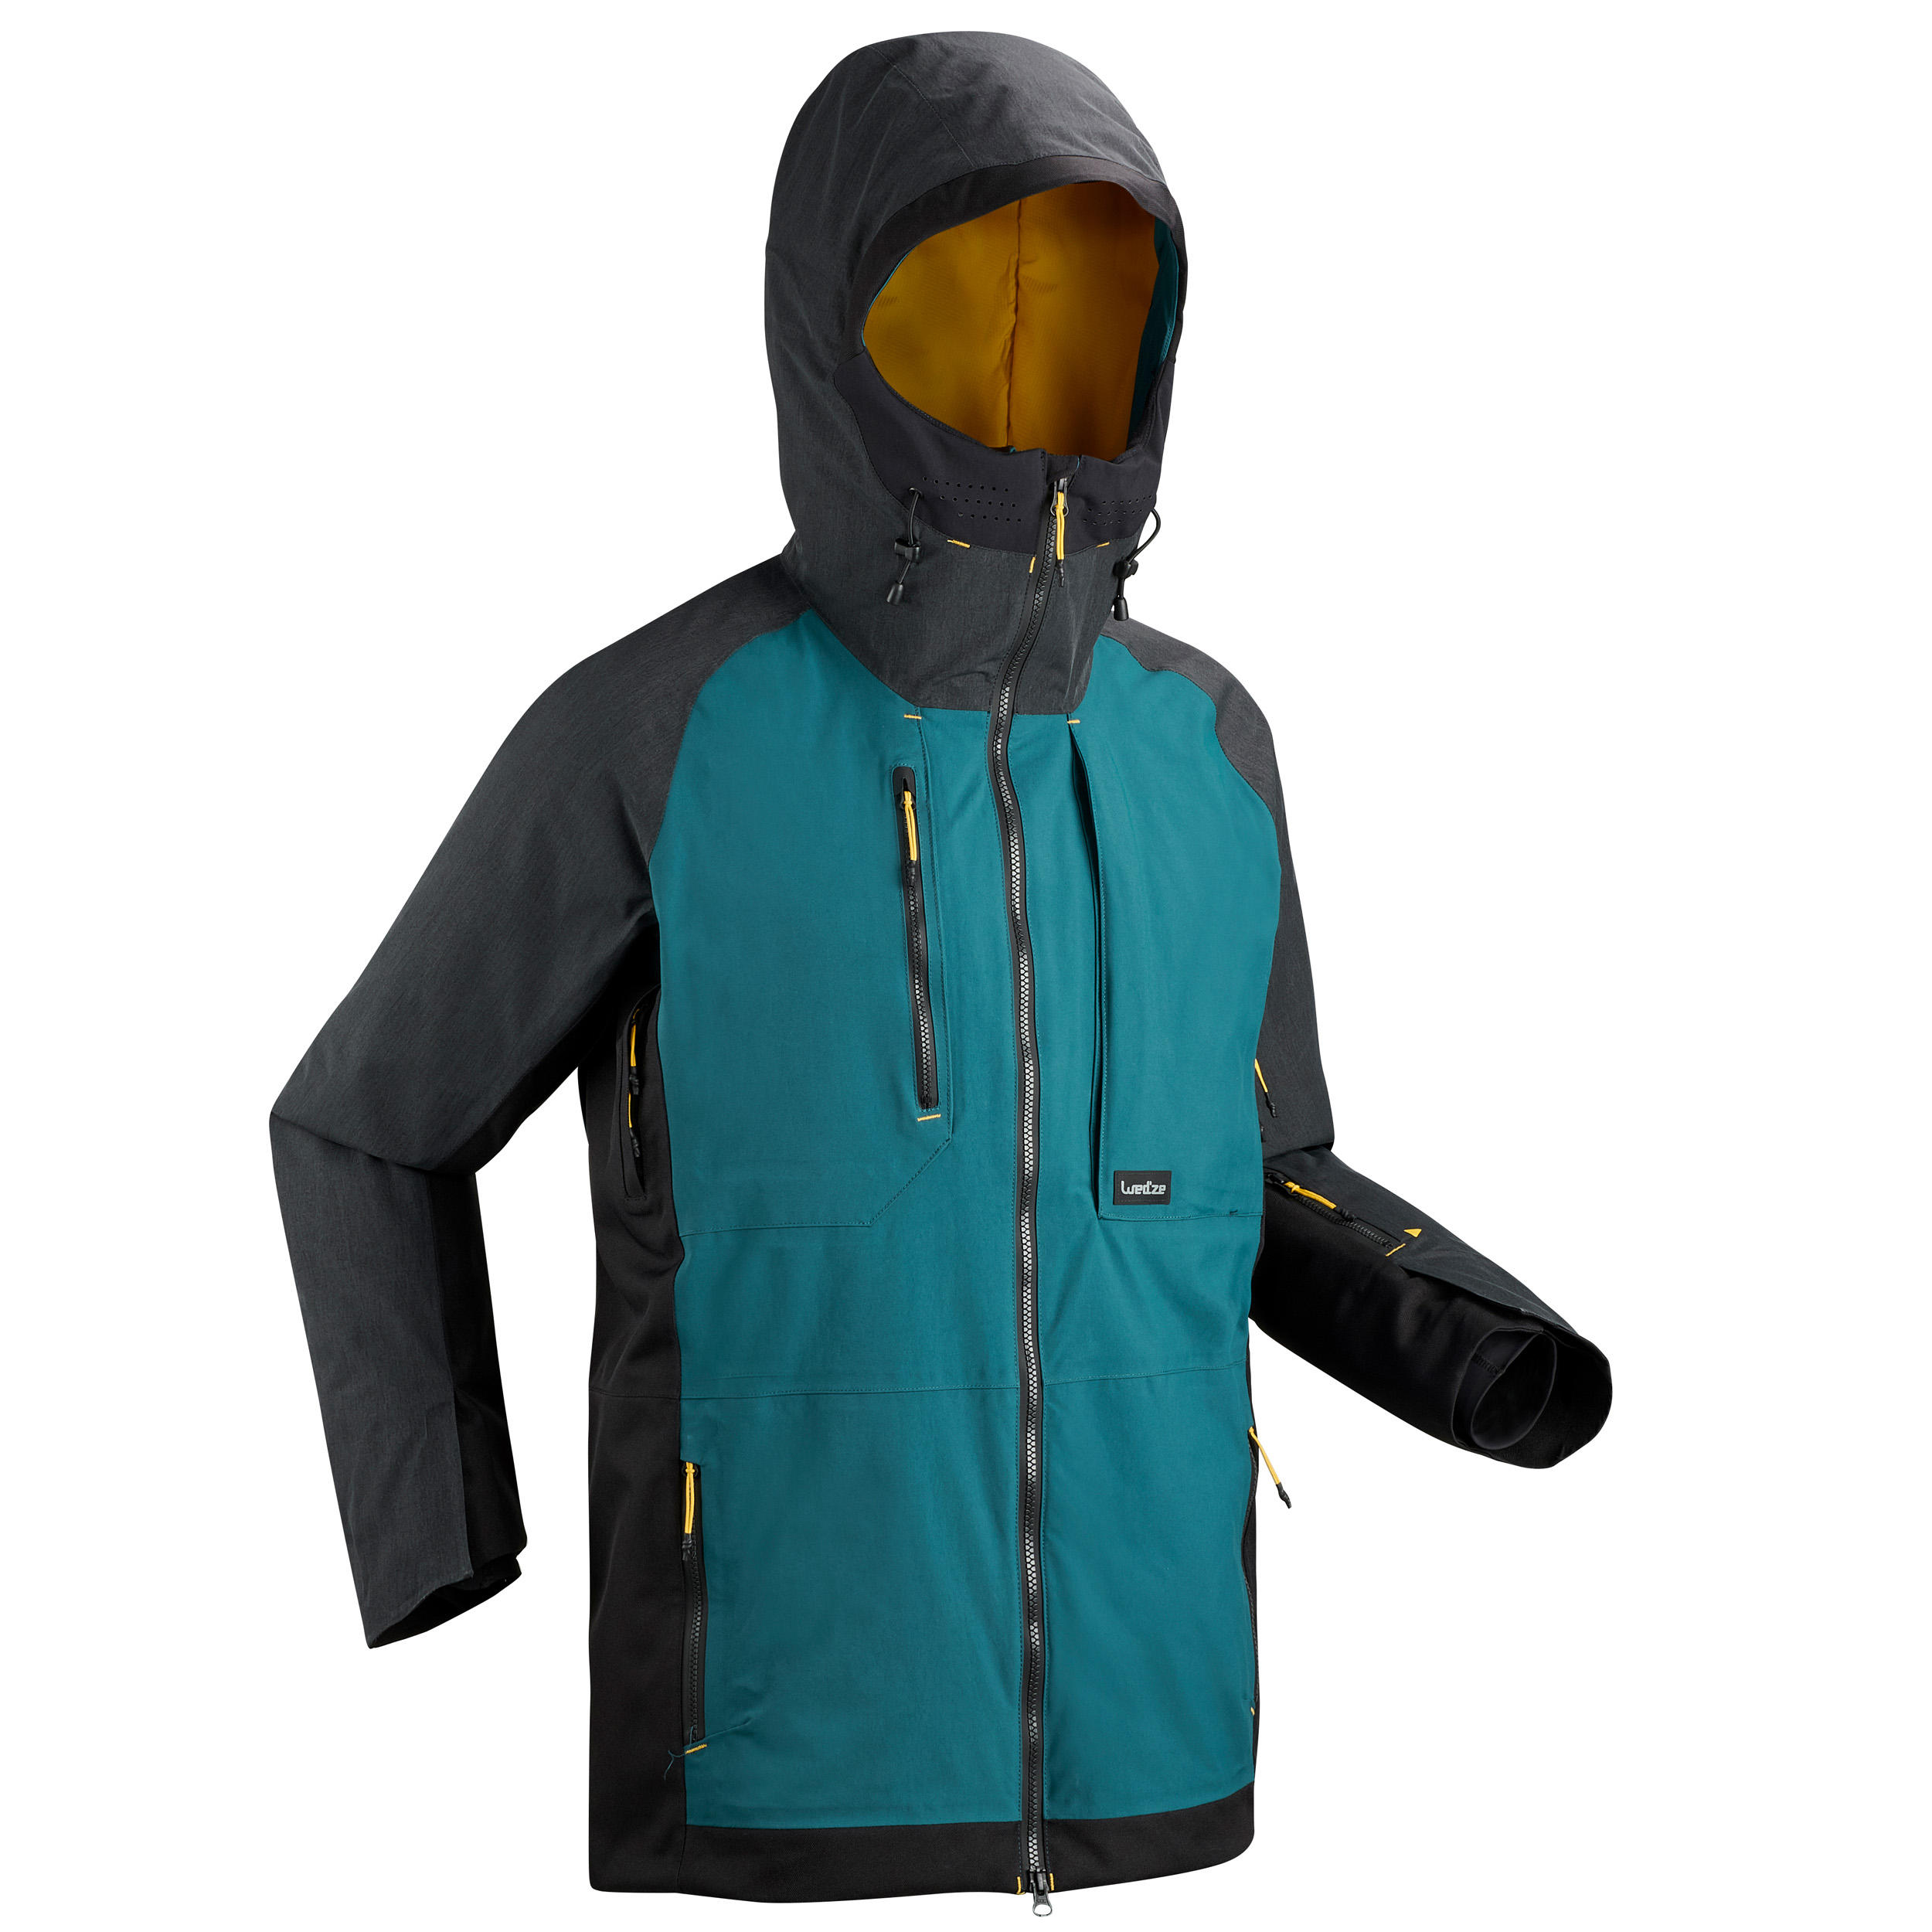 Snowboardjacke Skijacke 900 Herren petrolblau | Sportbekleidung > Sportjacken | Dreamscape